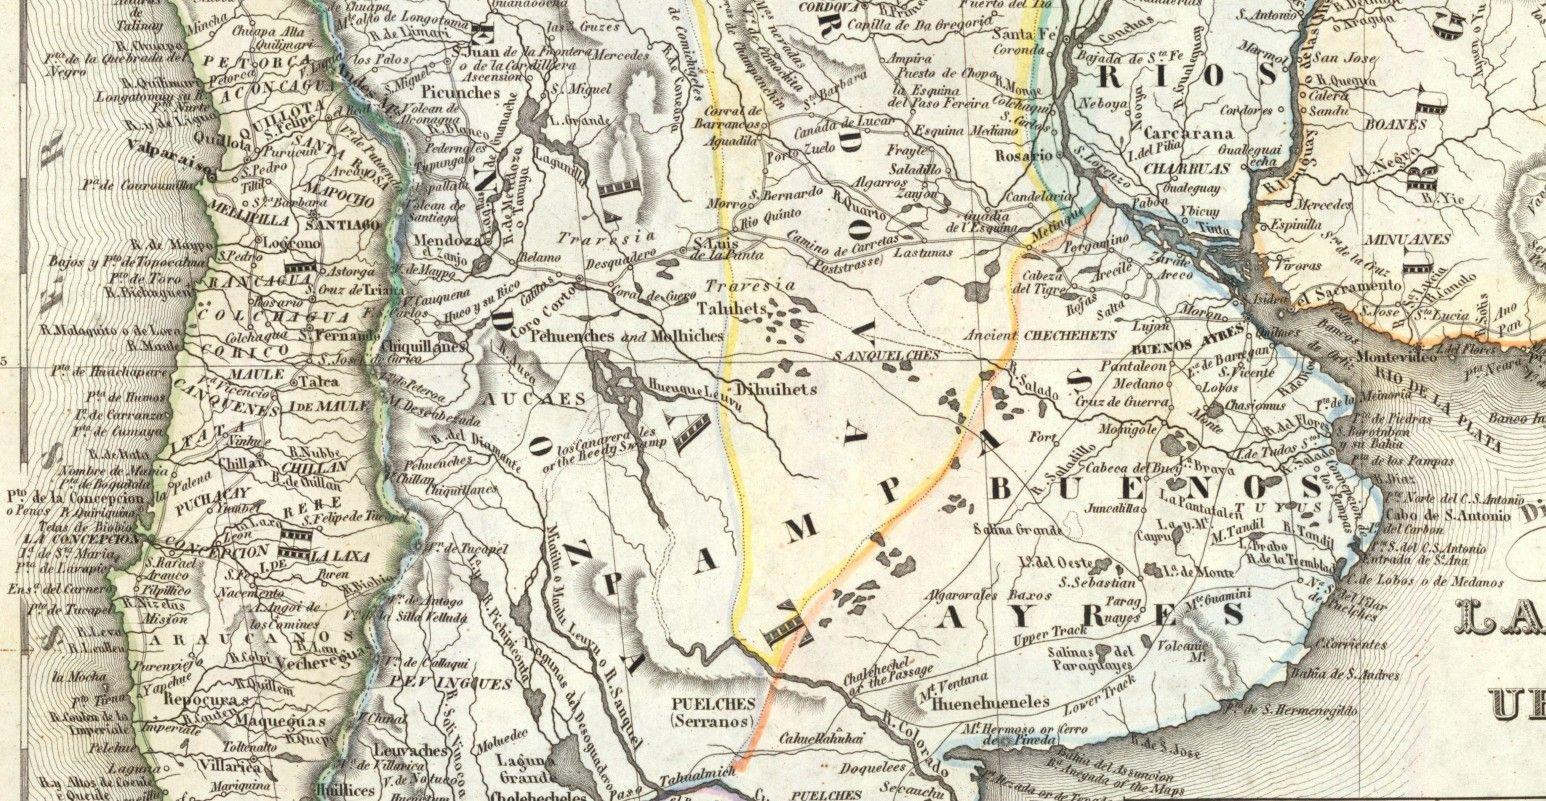 Etnohistoria de la Pampa: noviembre 2011